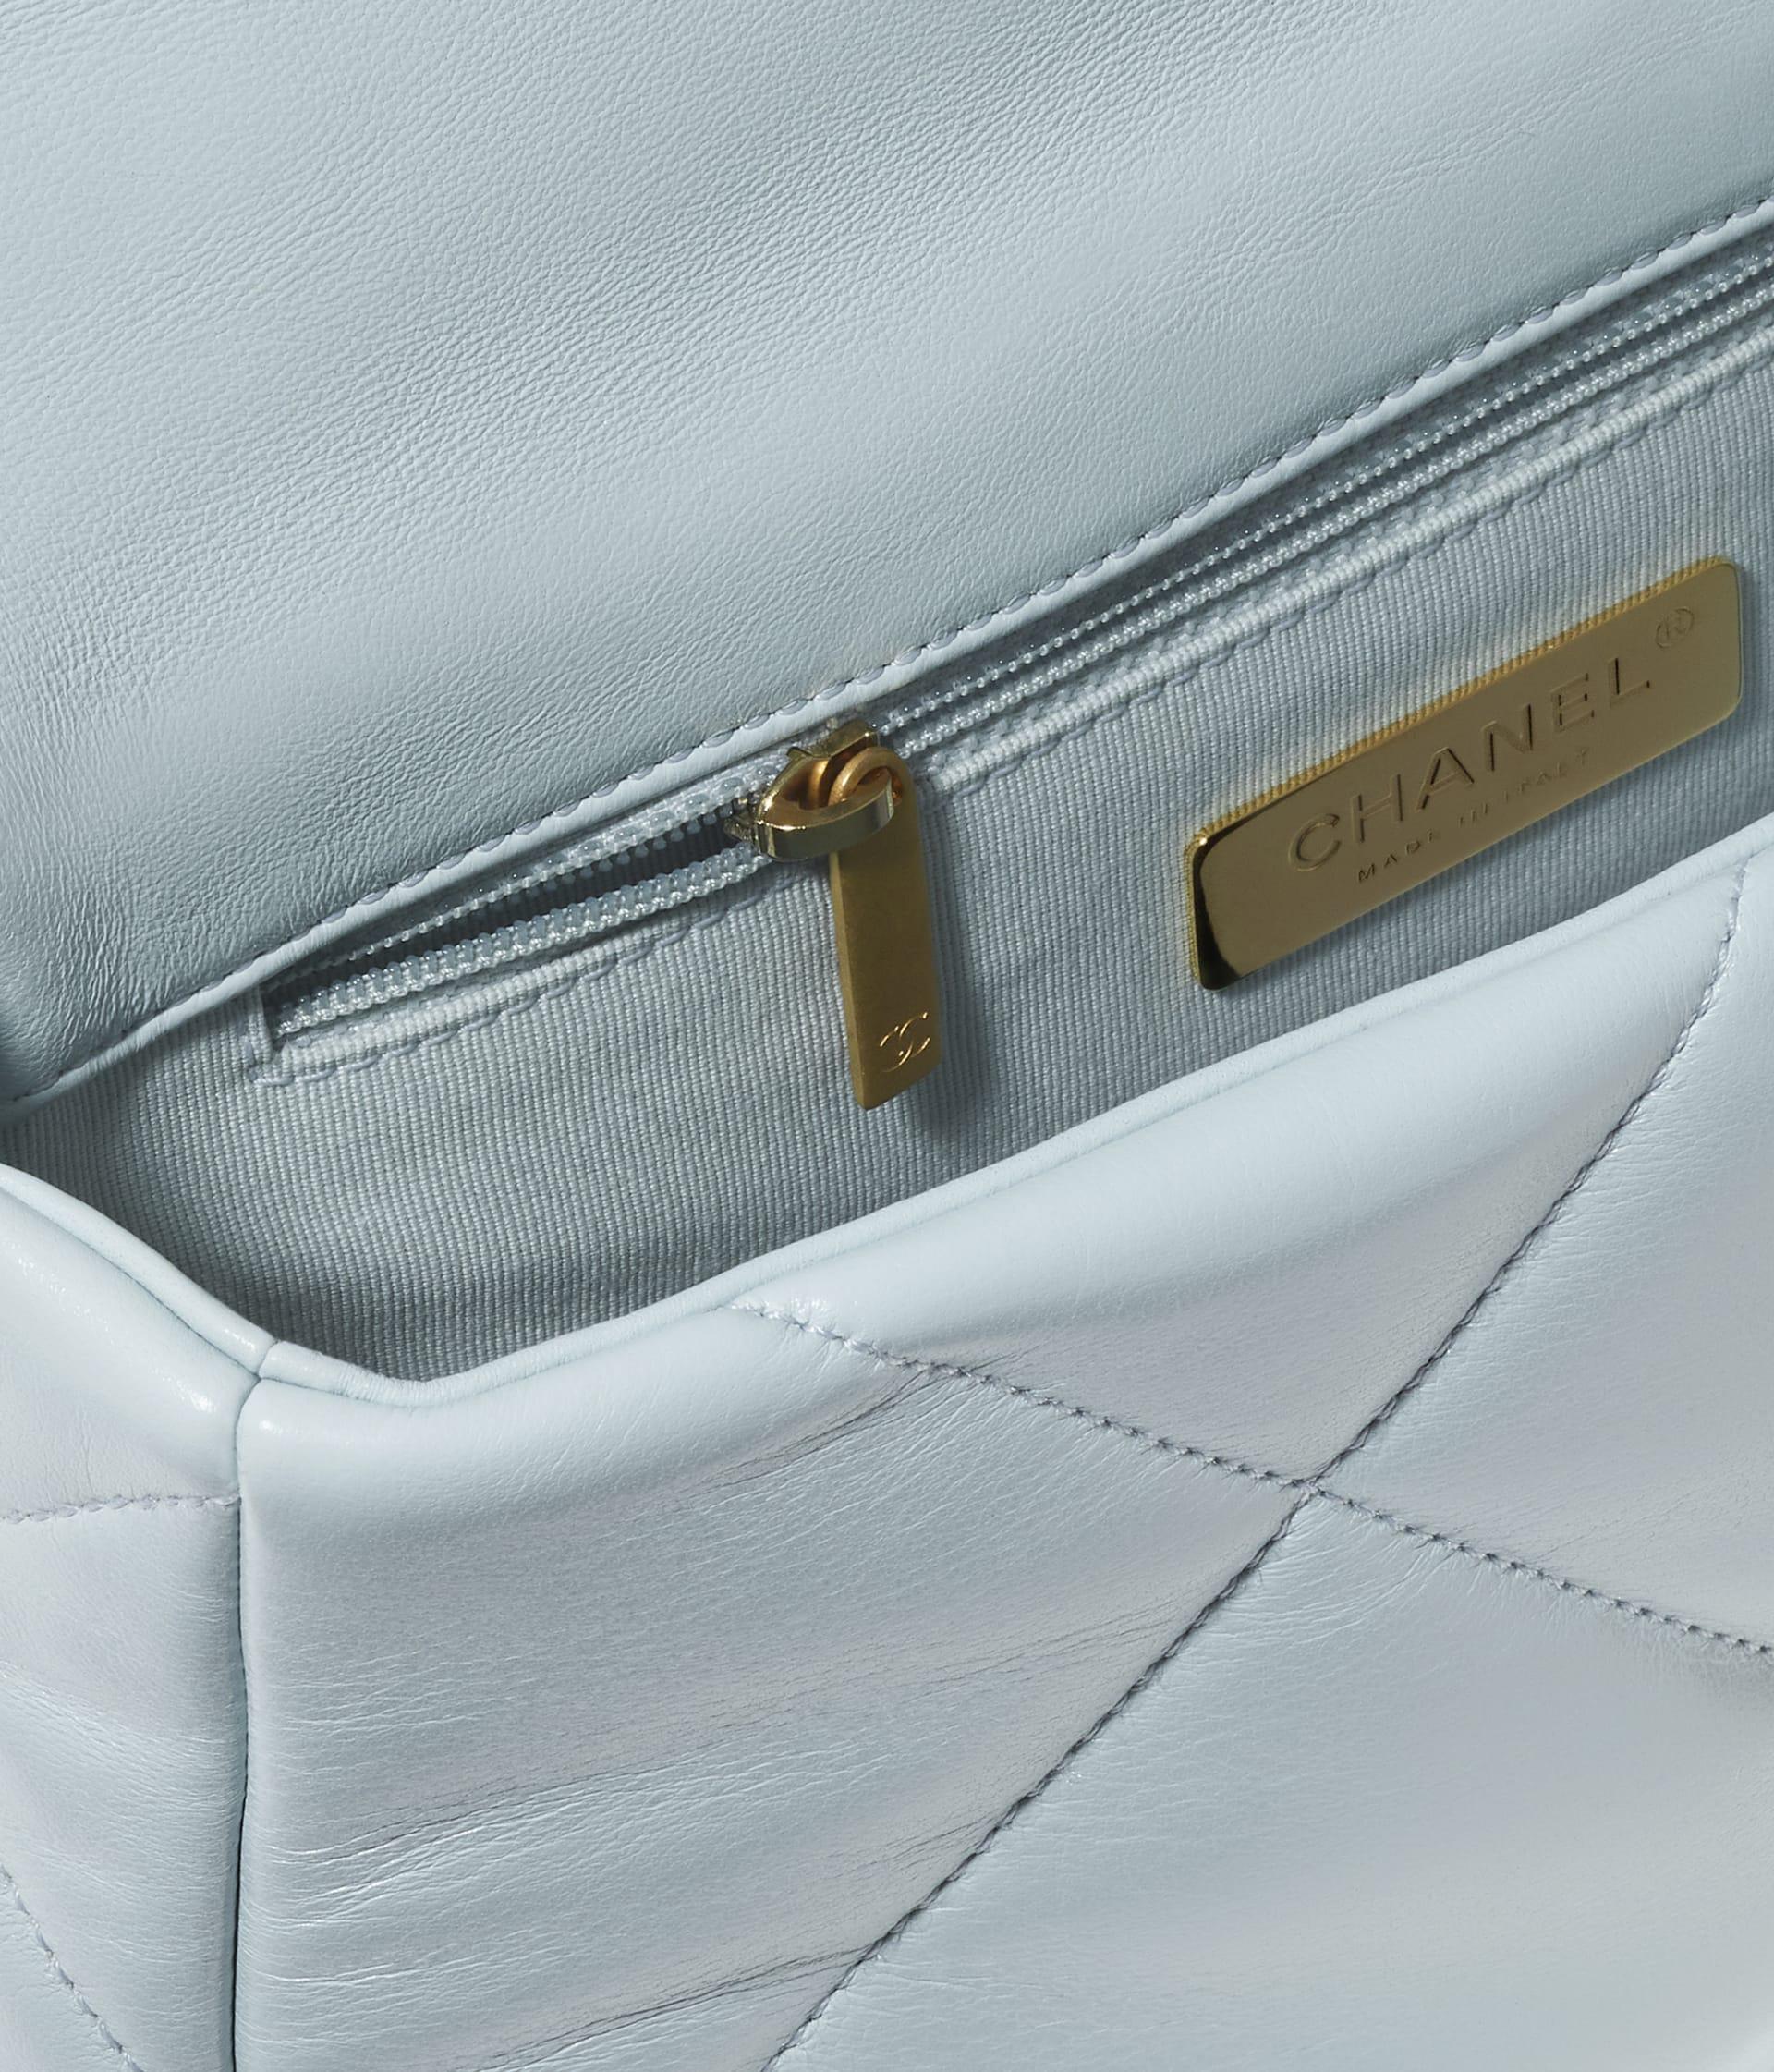 image 3 - CHANEL 19 Handbag - Lambskin, Gold-Tone, Silver-Tone & Ruthenium-Finish Metal - Light Blue